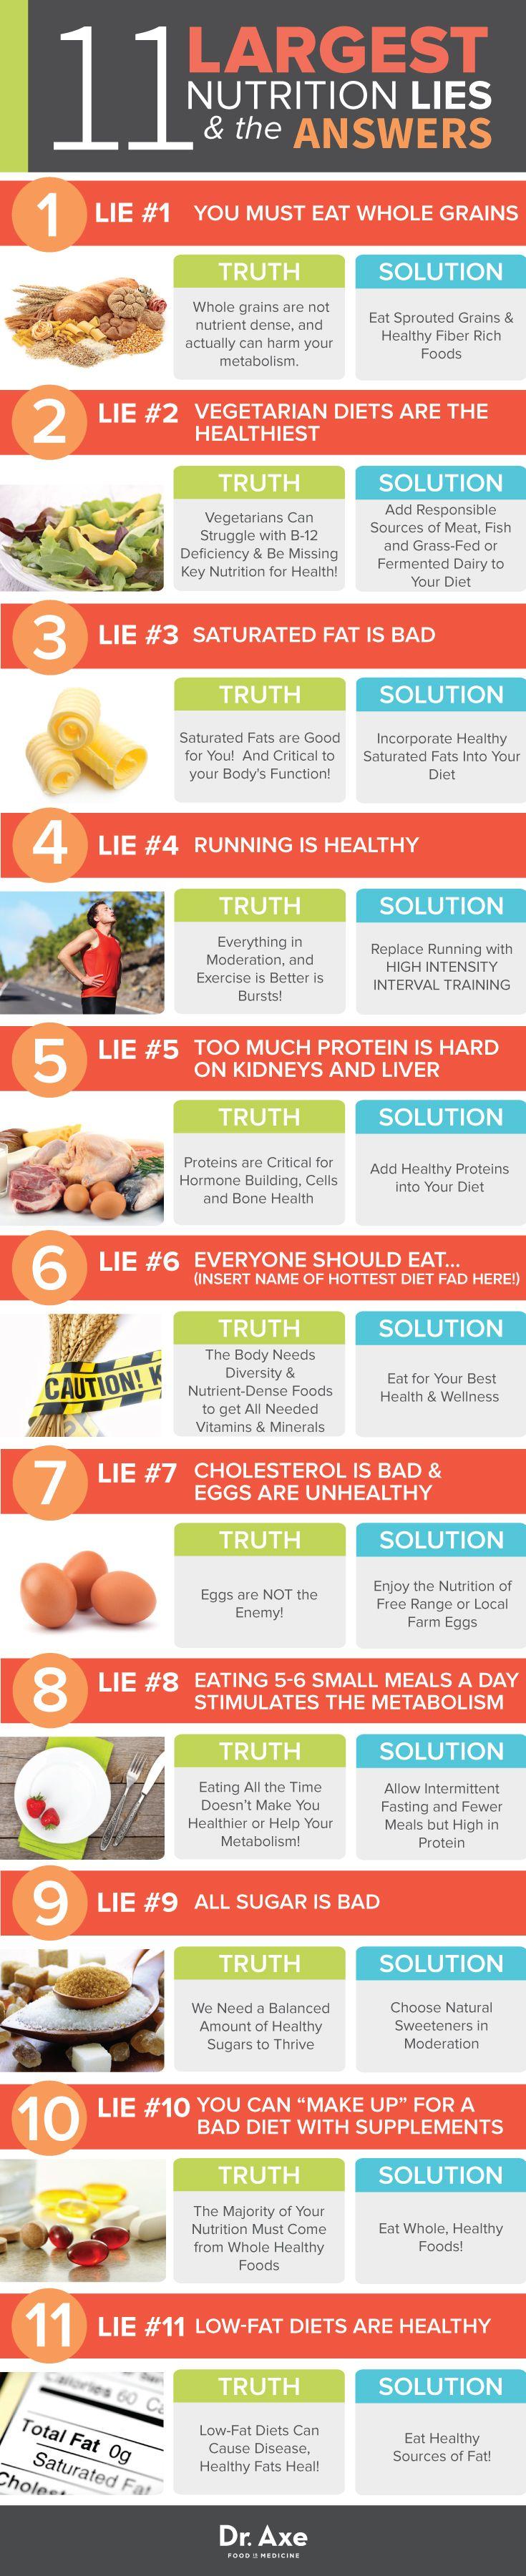 Nutrition Lies http://www.draxe.com #health #holistic #natural